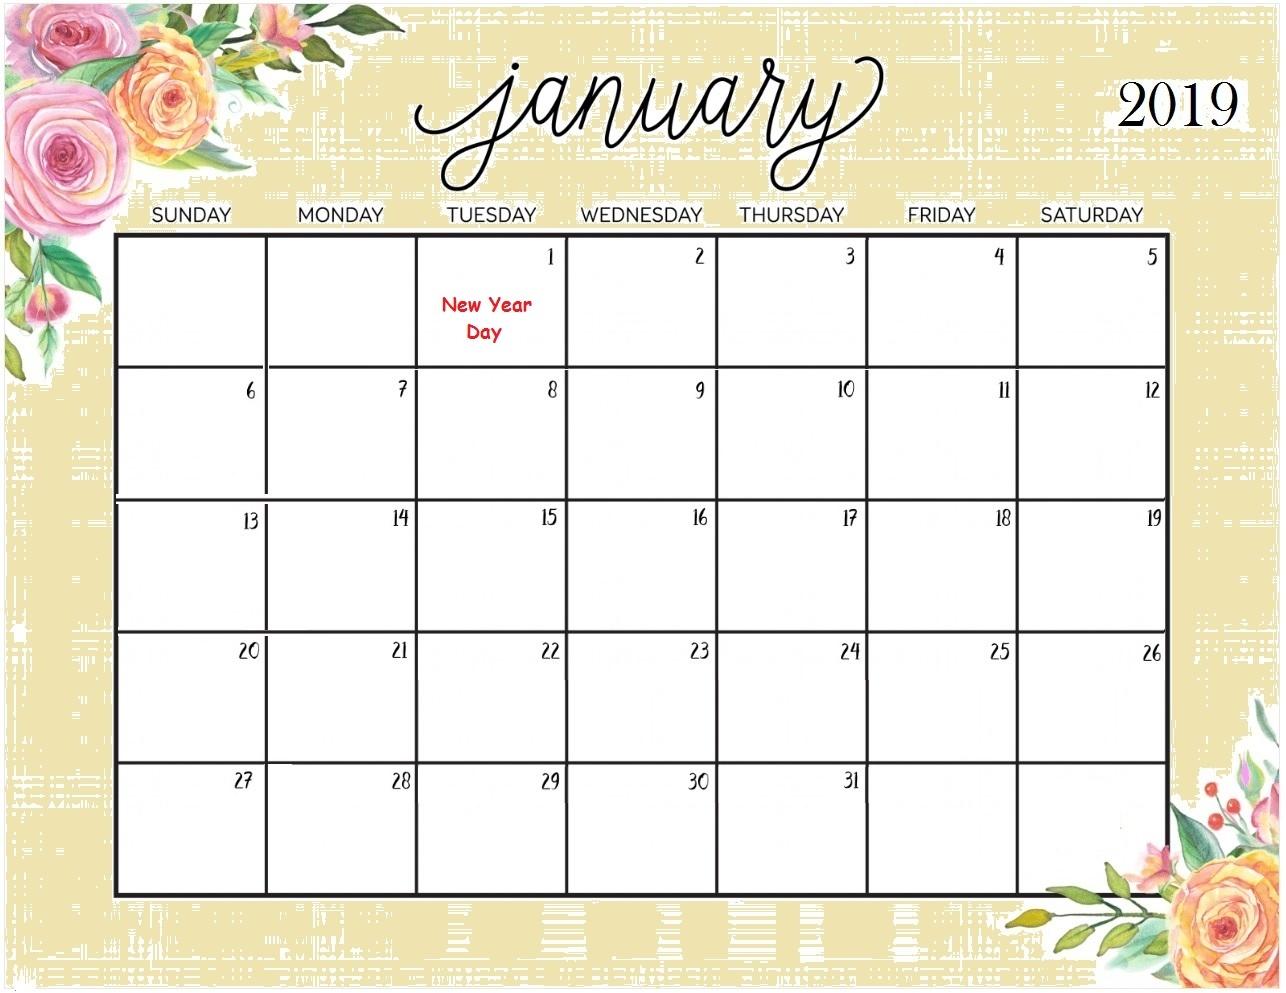 january 2019 calendar printable archives printable calendar 2018::Print January 2019 Calendar